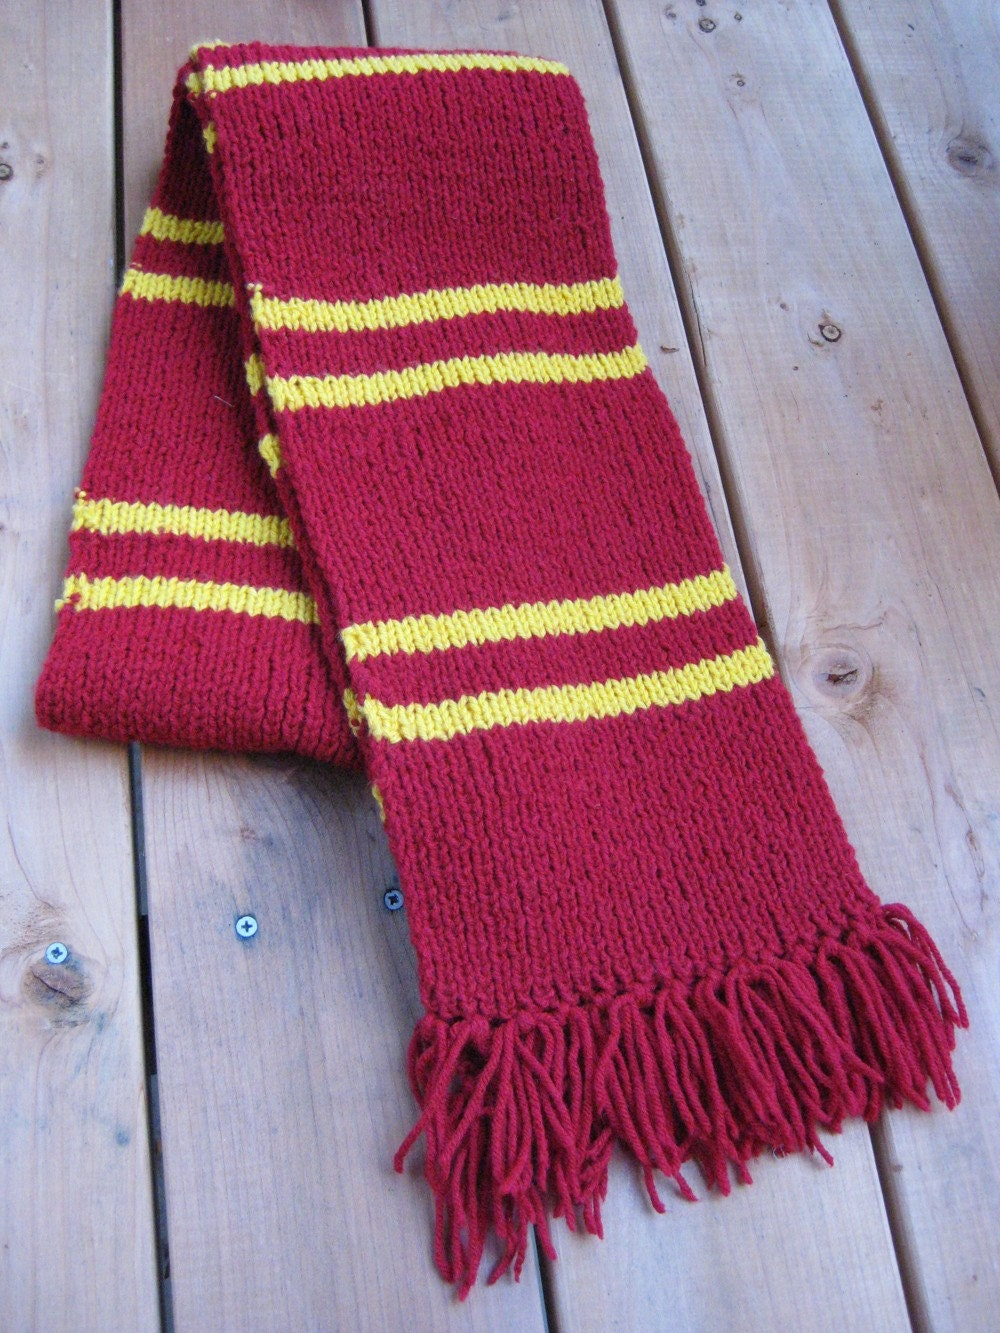 Harry Potter Gryffindor scarf by knitsplus on Etsy